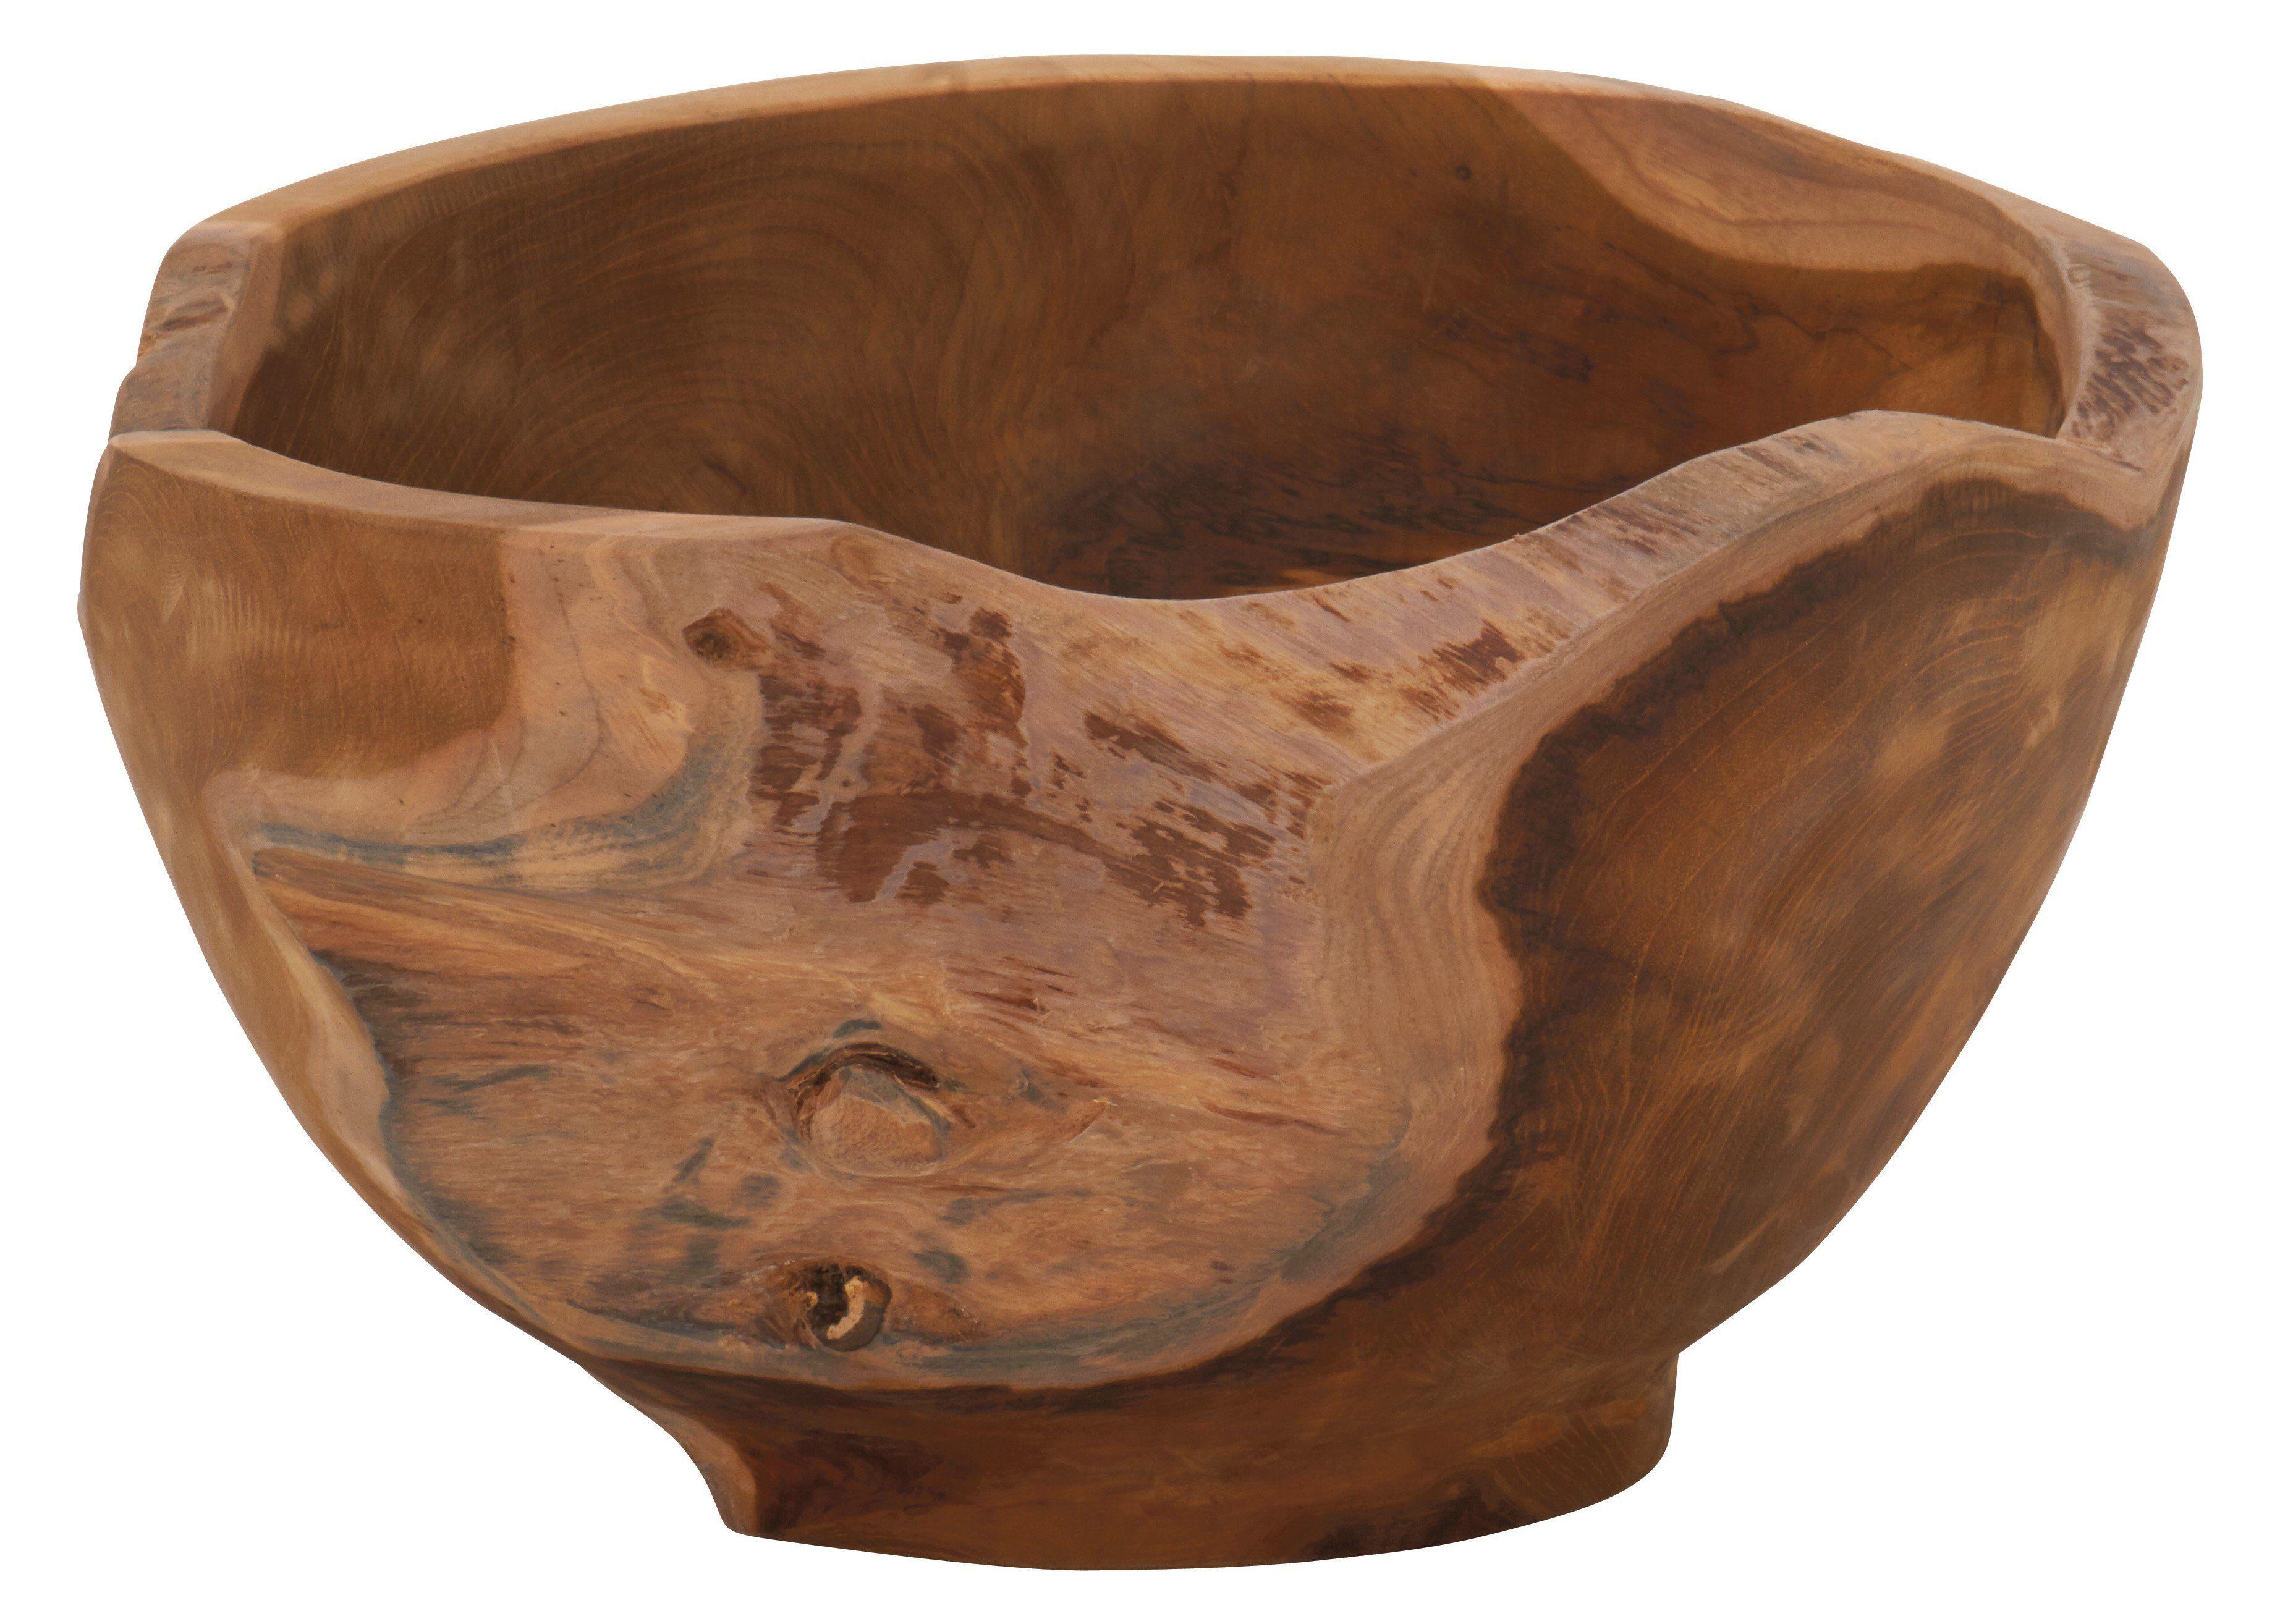 Decmode teak wood decorative bowl 42027